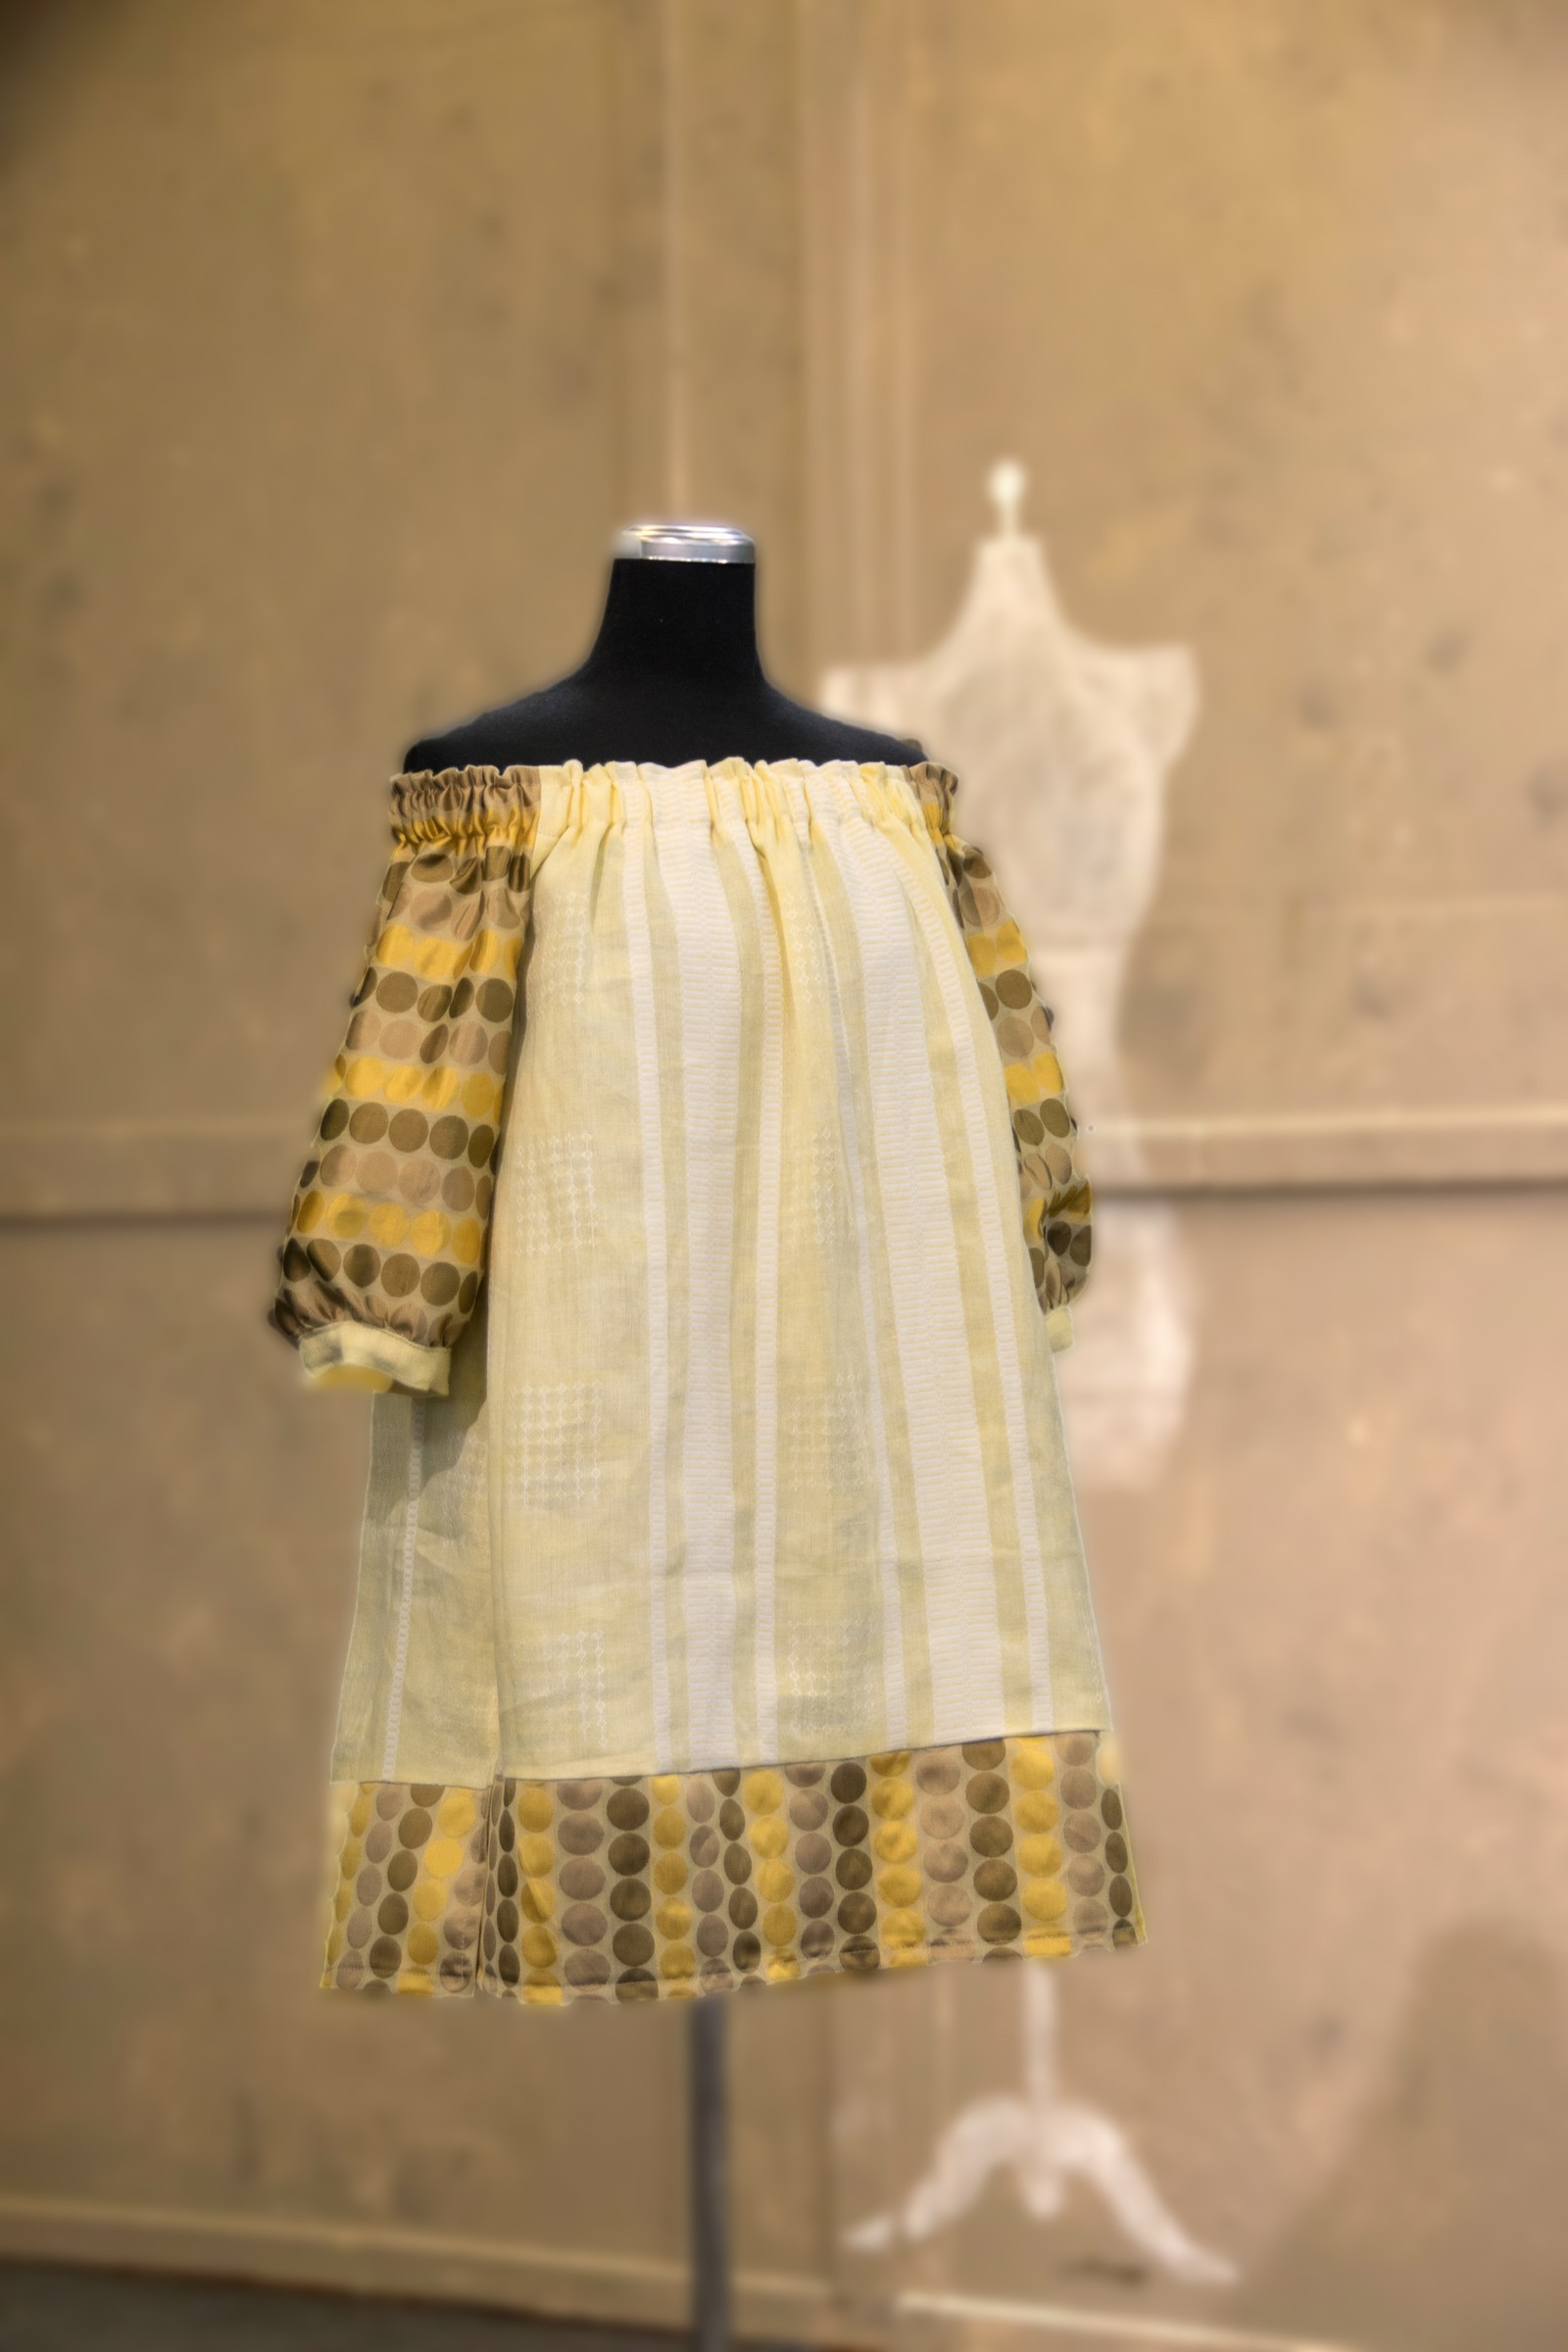 - Det er noe Art Deco over denne blusen, sa Jenny Skavlan til Ellen om blusen hennes. Den var lik foran og bak.